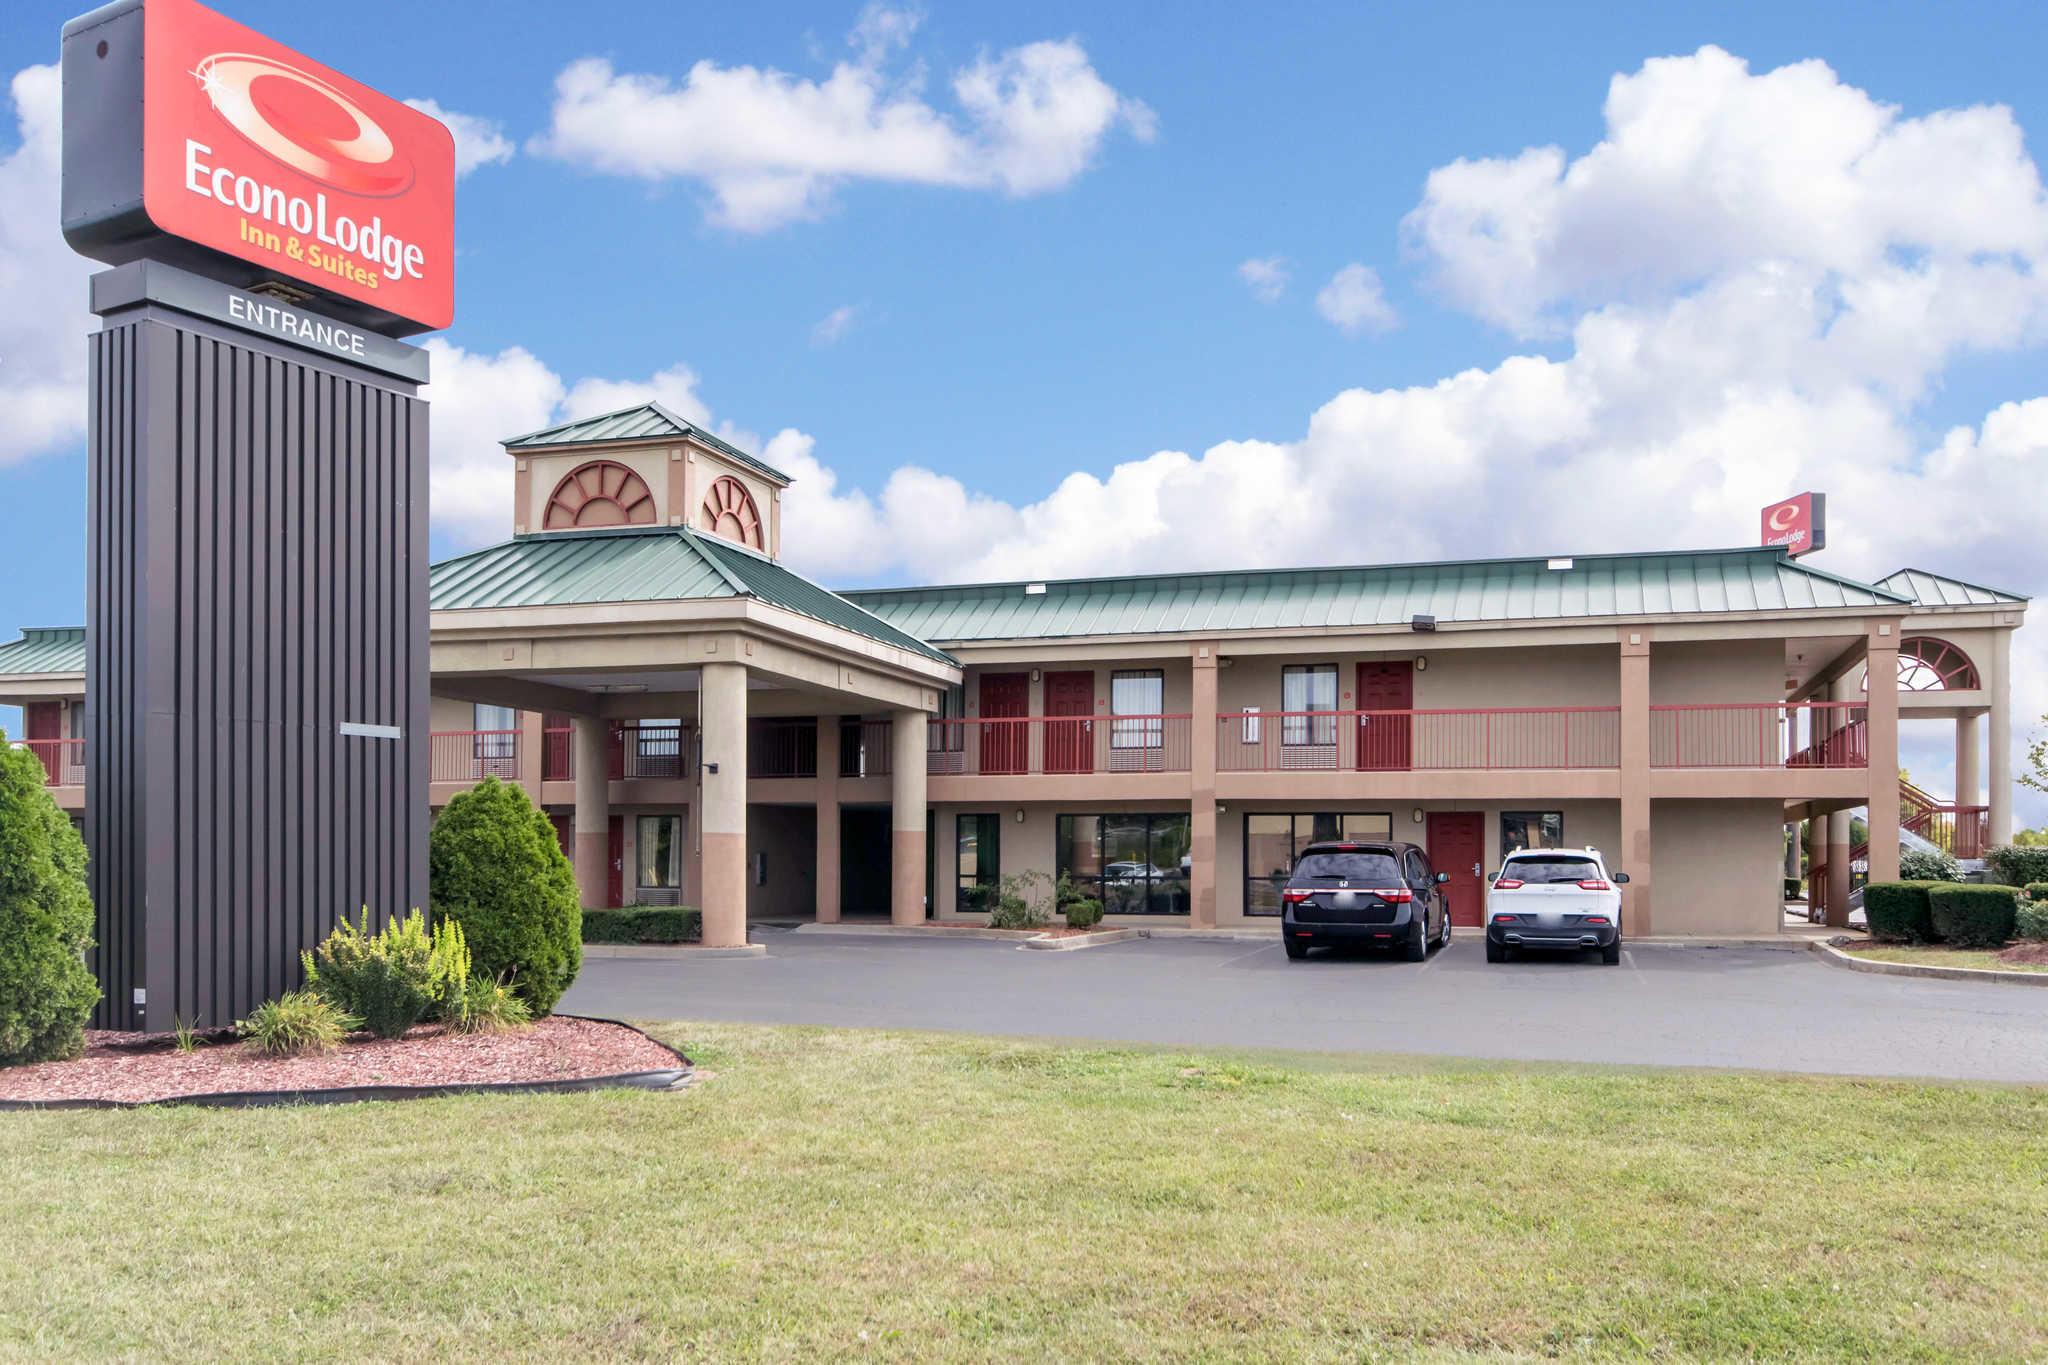 Econo Lodge Inn & Suites I-65 image 0